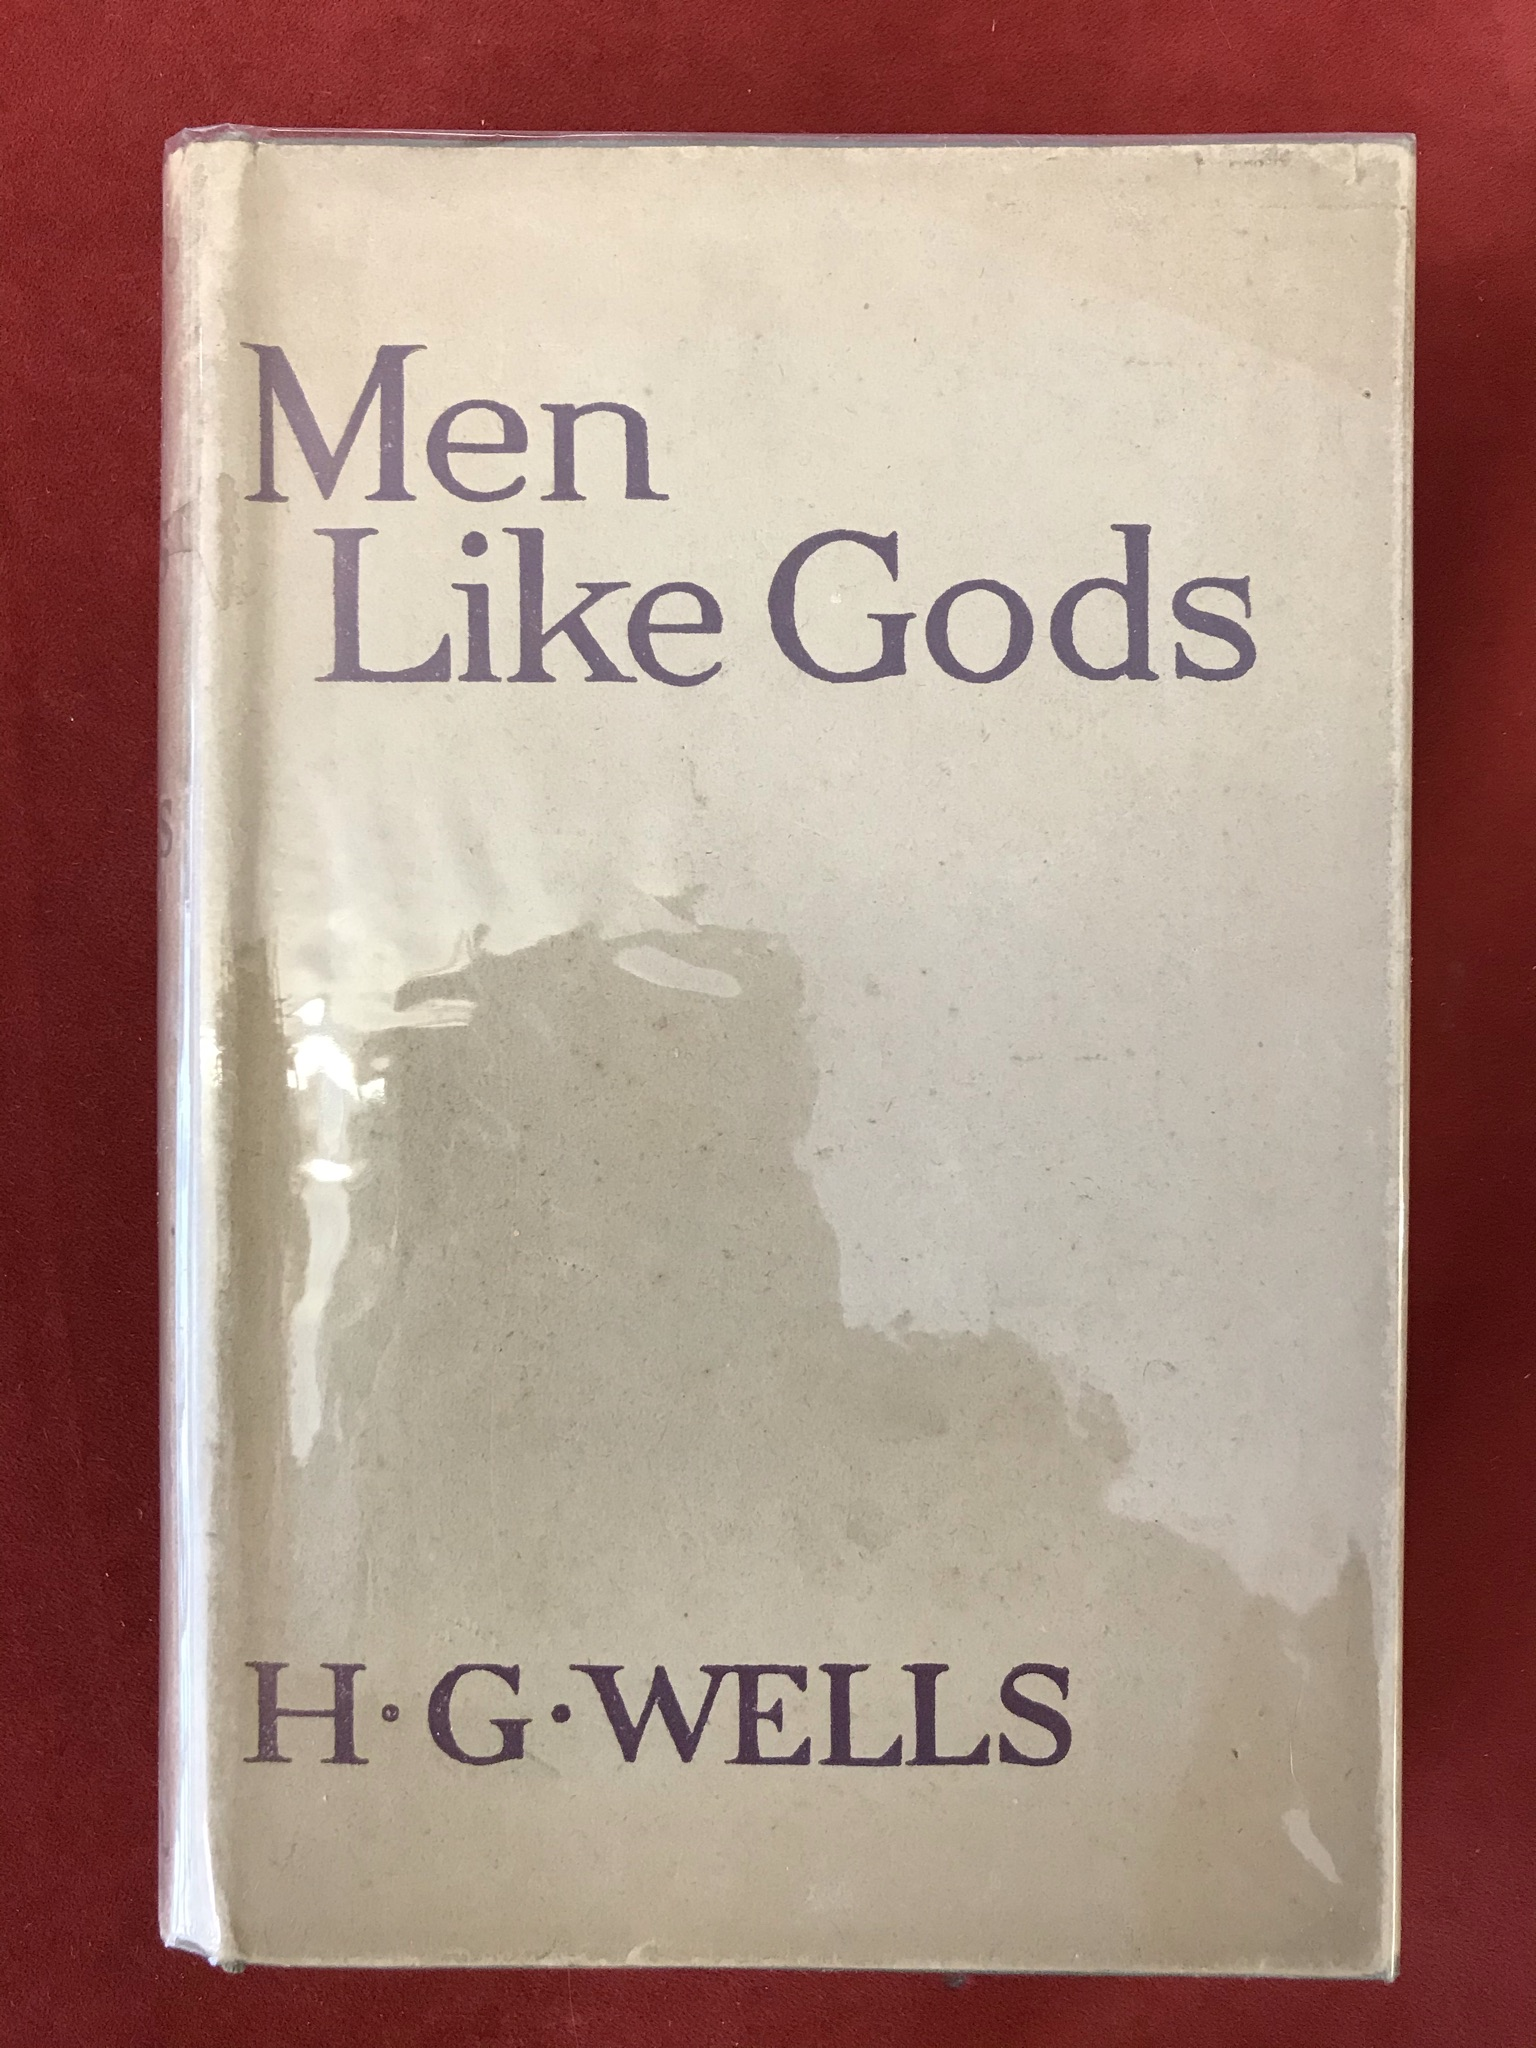 Men Like GodsFirst edition, 1923